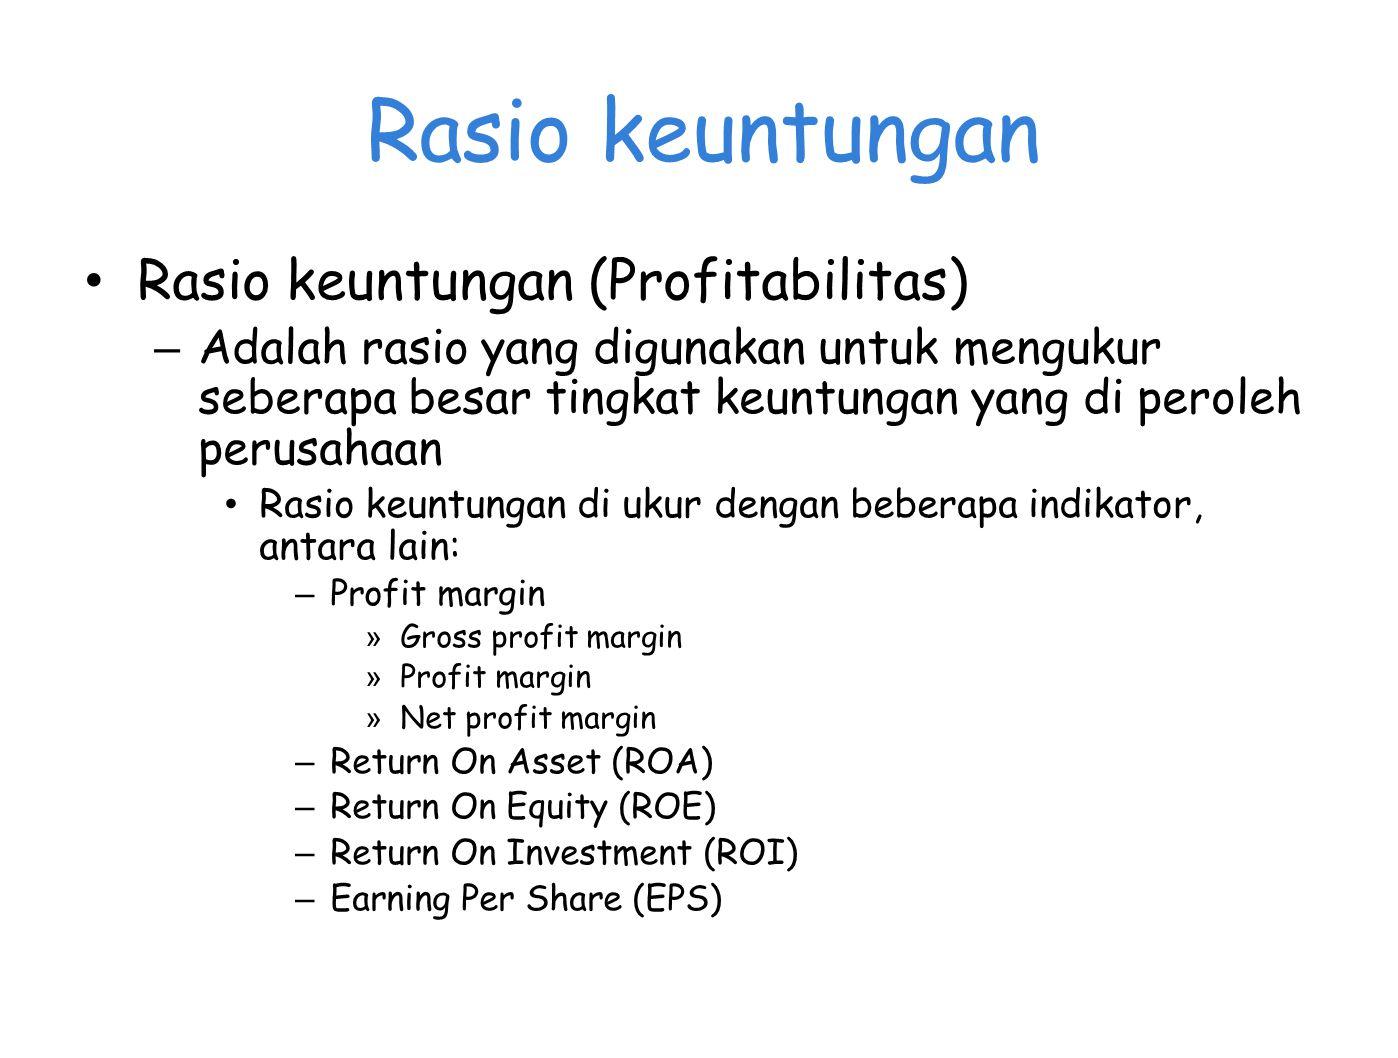 Rasio keuntungan Rasio keuntungan (Profitabilitas) – Adalah rasio yang digunakan untuk mengukur seberapa besar tingkat keuntungan yang di peroleh perusahaan Rasio keuntungan di ukur dengan beberapa indikator, antara lain: – Profit margin » Gross profit margin » Profit margin » Net profit margin – Return On Asset (ROA) – Return On Equity (ROE) – Return On Investment (ROI) – Earning Per Share (EPS)